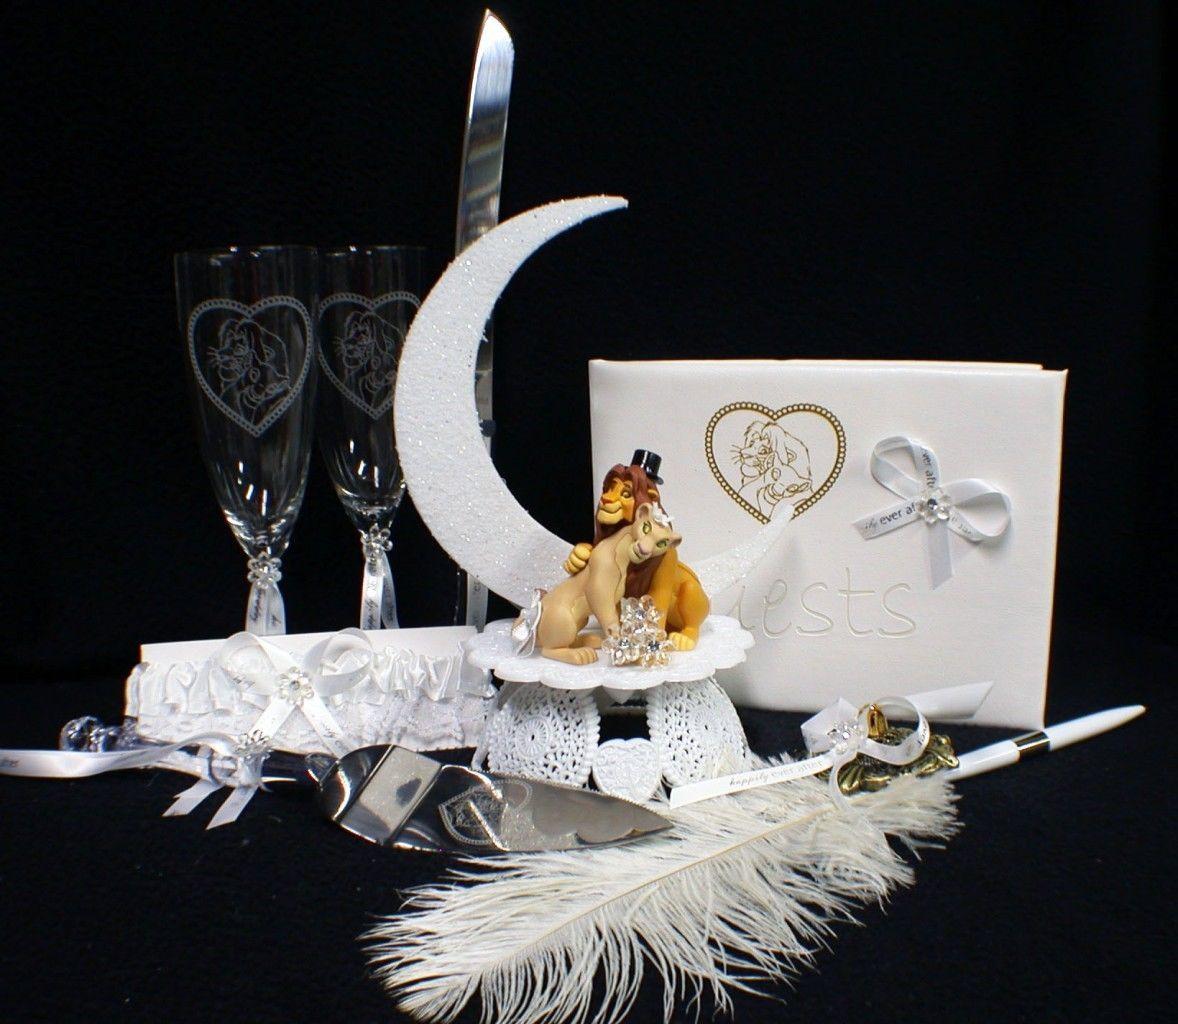 Lion King Disney Wedding Cake Topper Lot Gles Server Guest Book Garter Pen